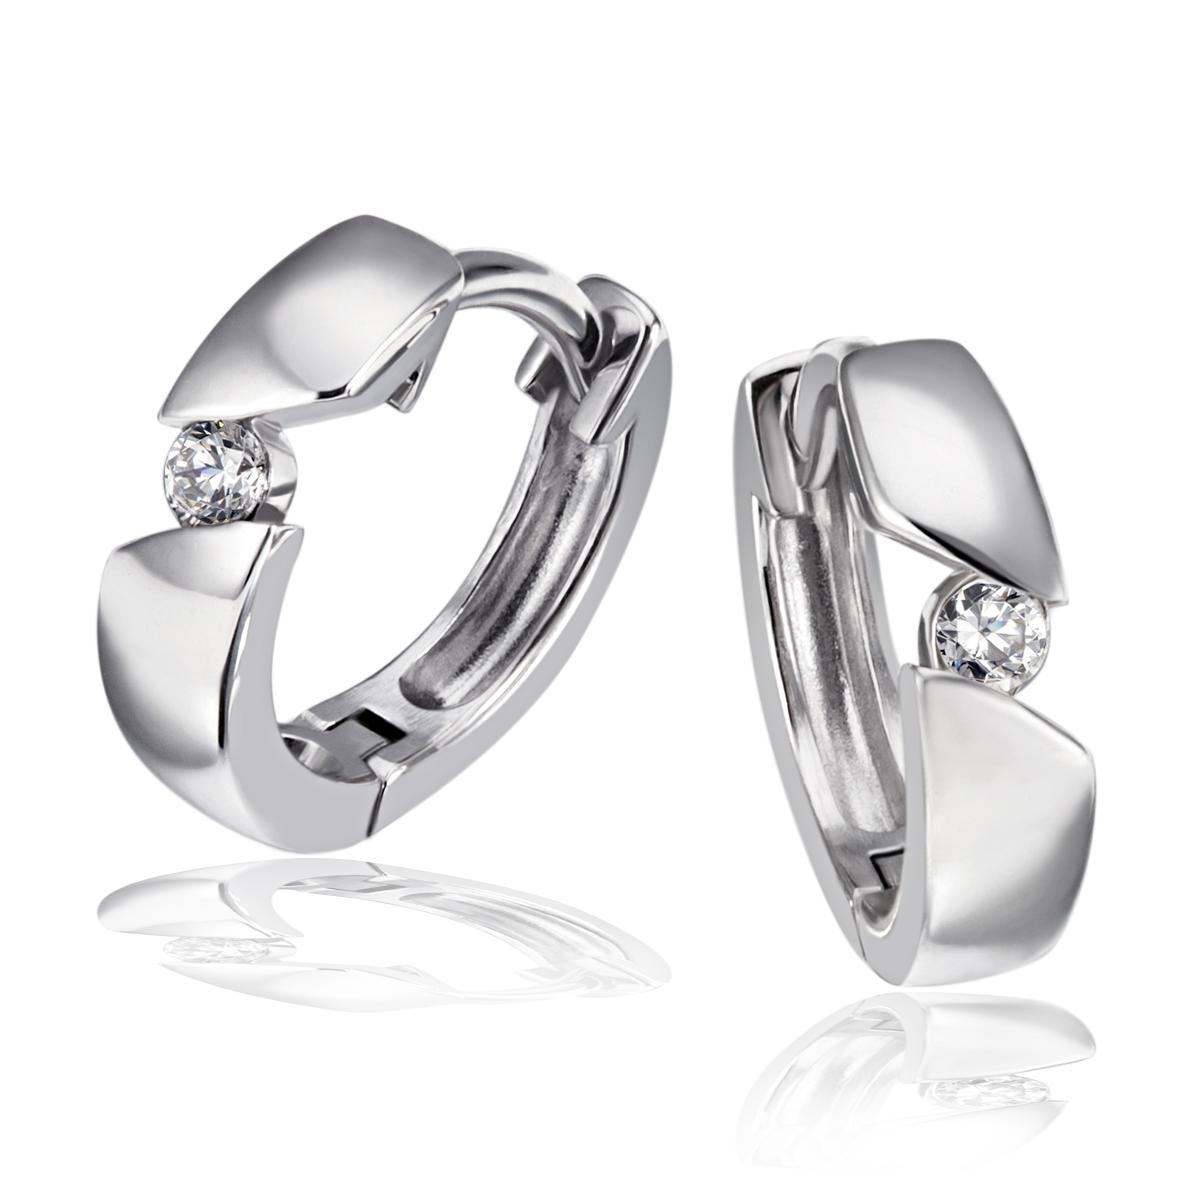 Goldmaid-Ring-Collier-oder-Ohrring-925er-Silber-1Brillant-0-08-ct-Echtschmuck